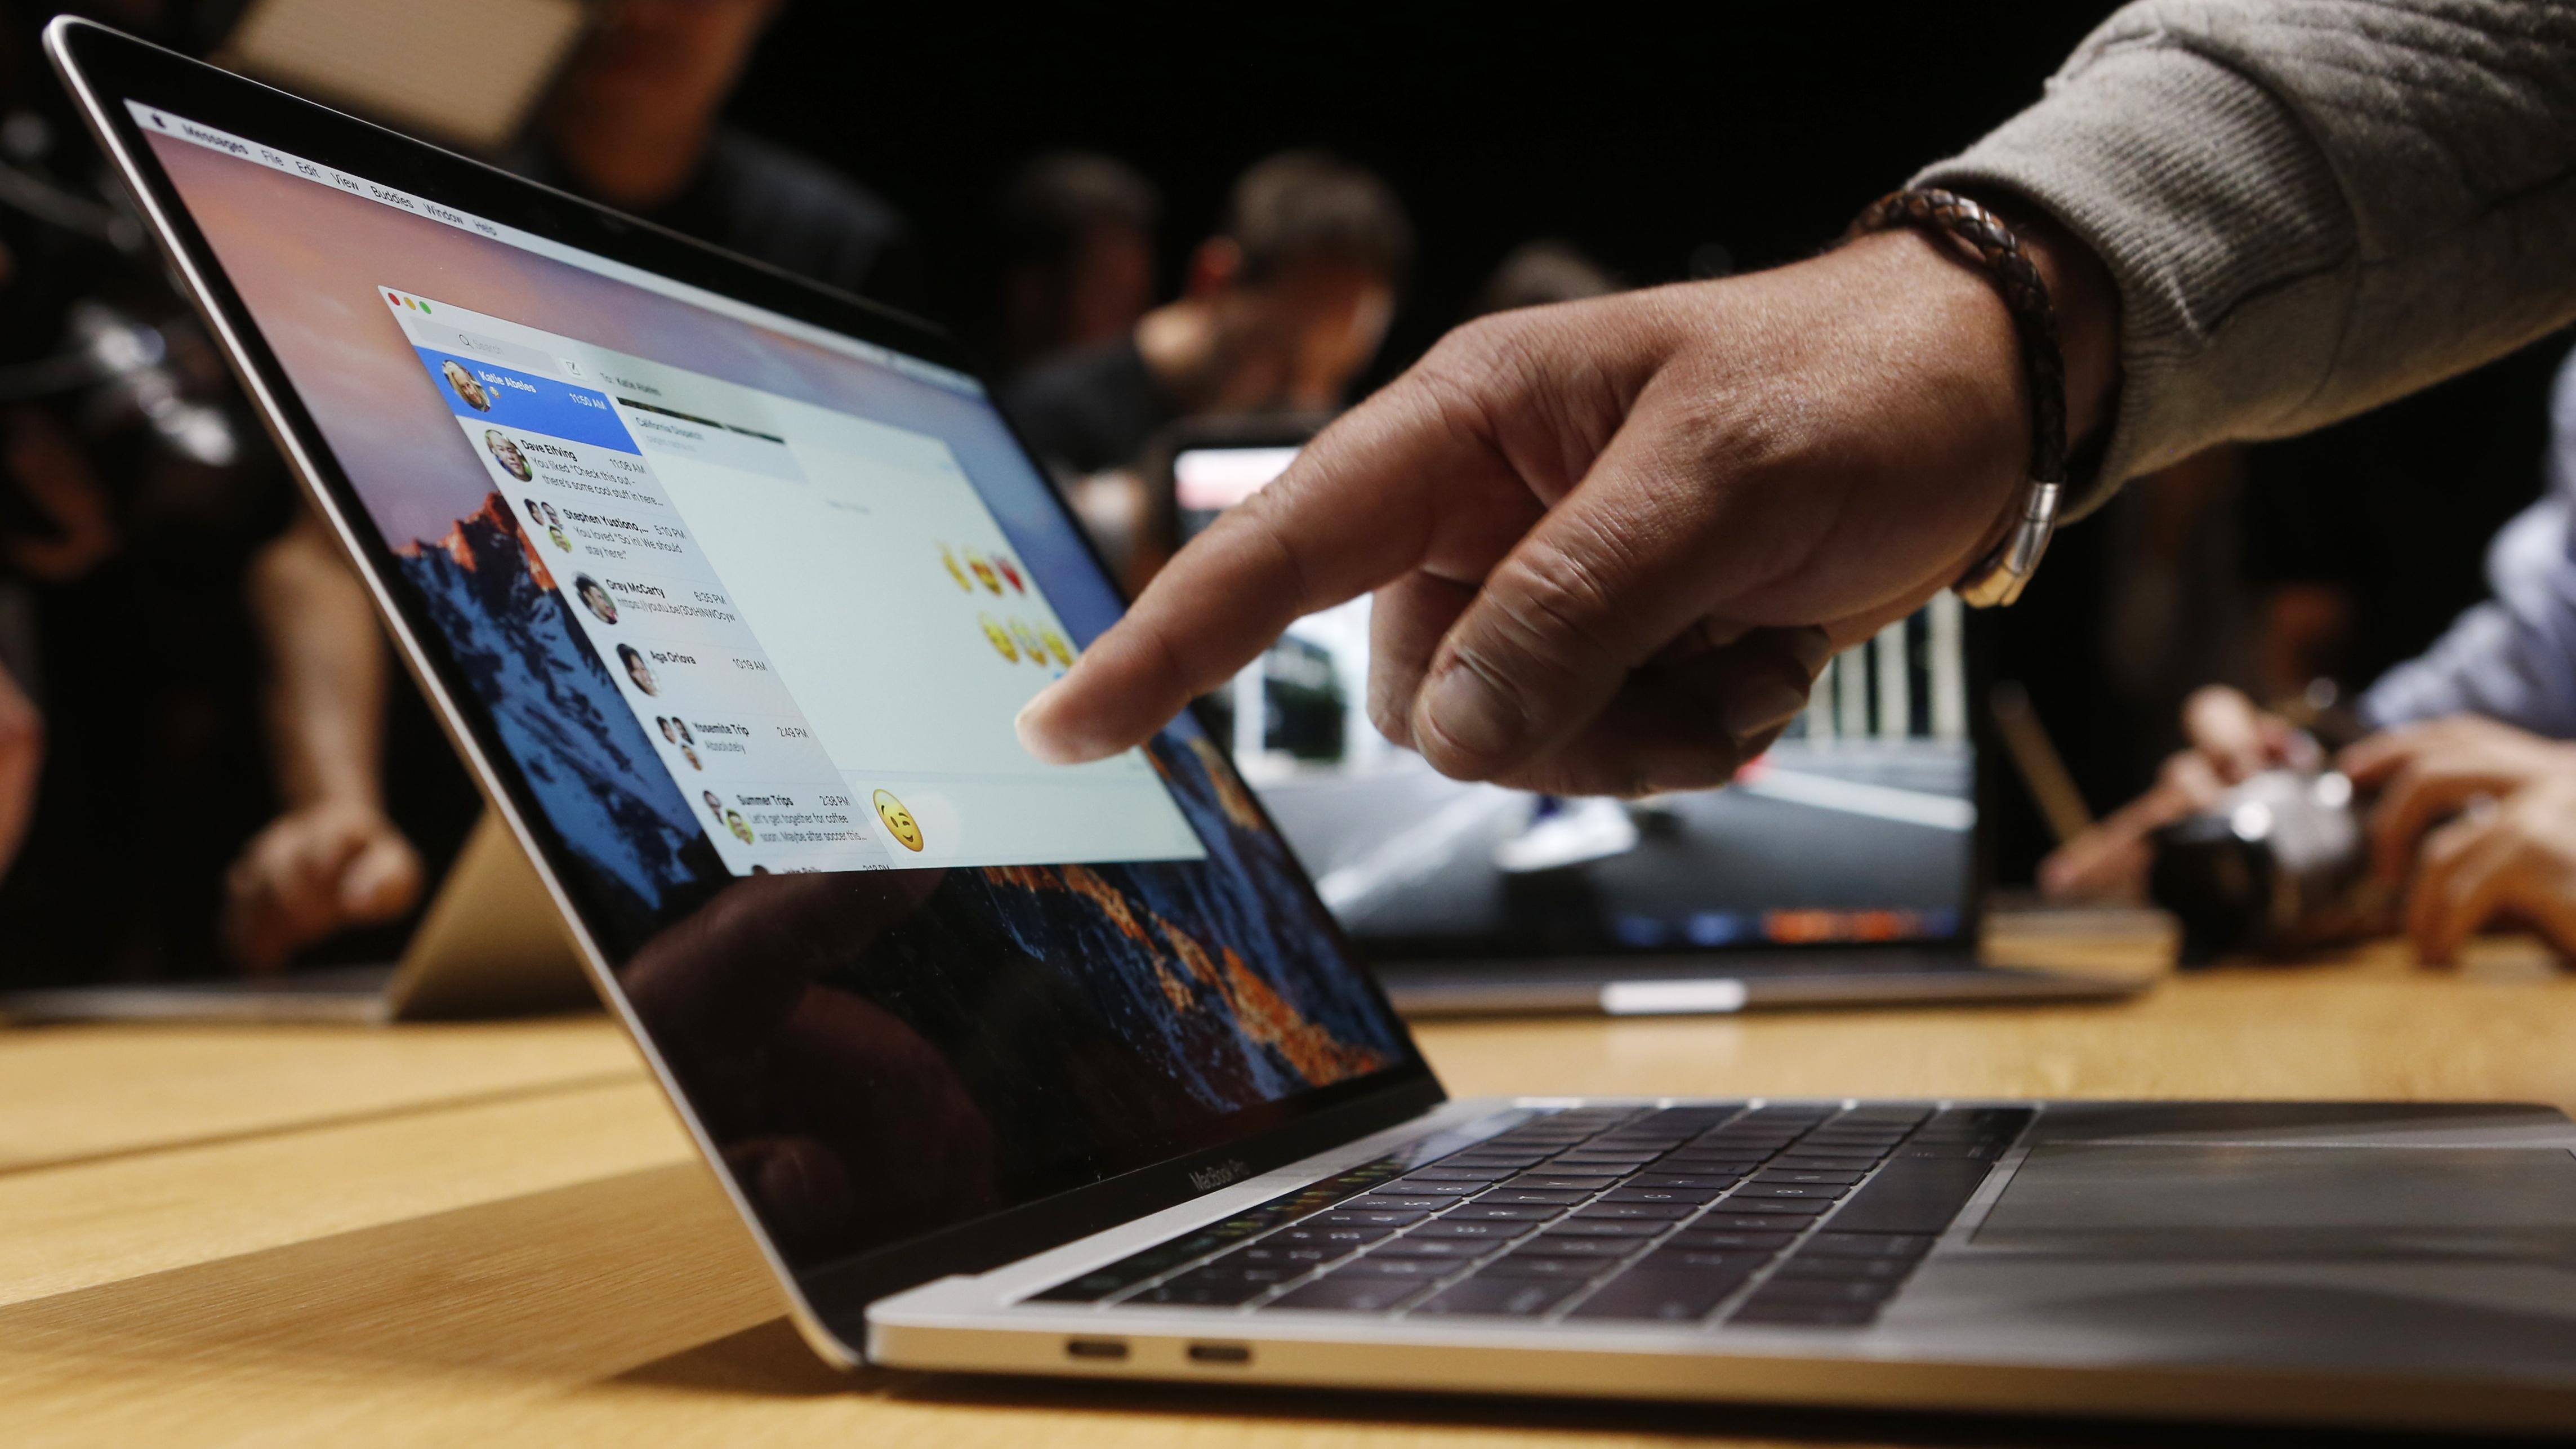 Apple MacBook Pro processor Turbo Boost